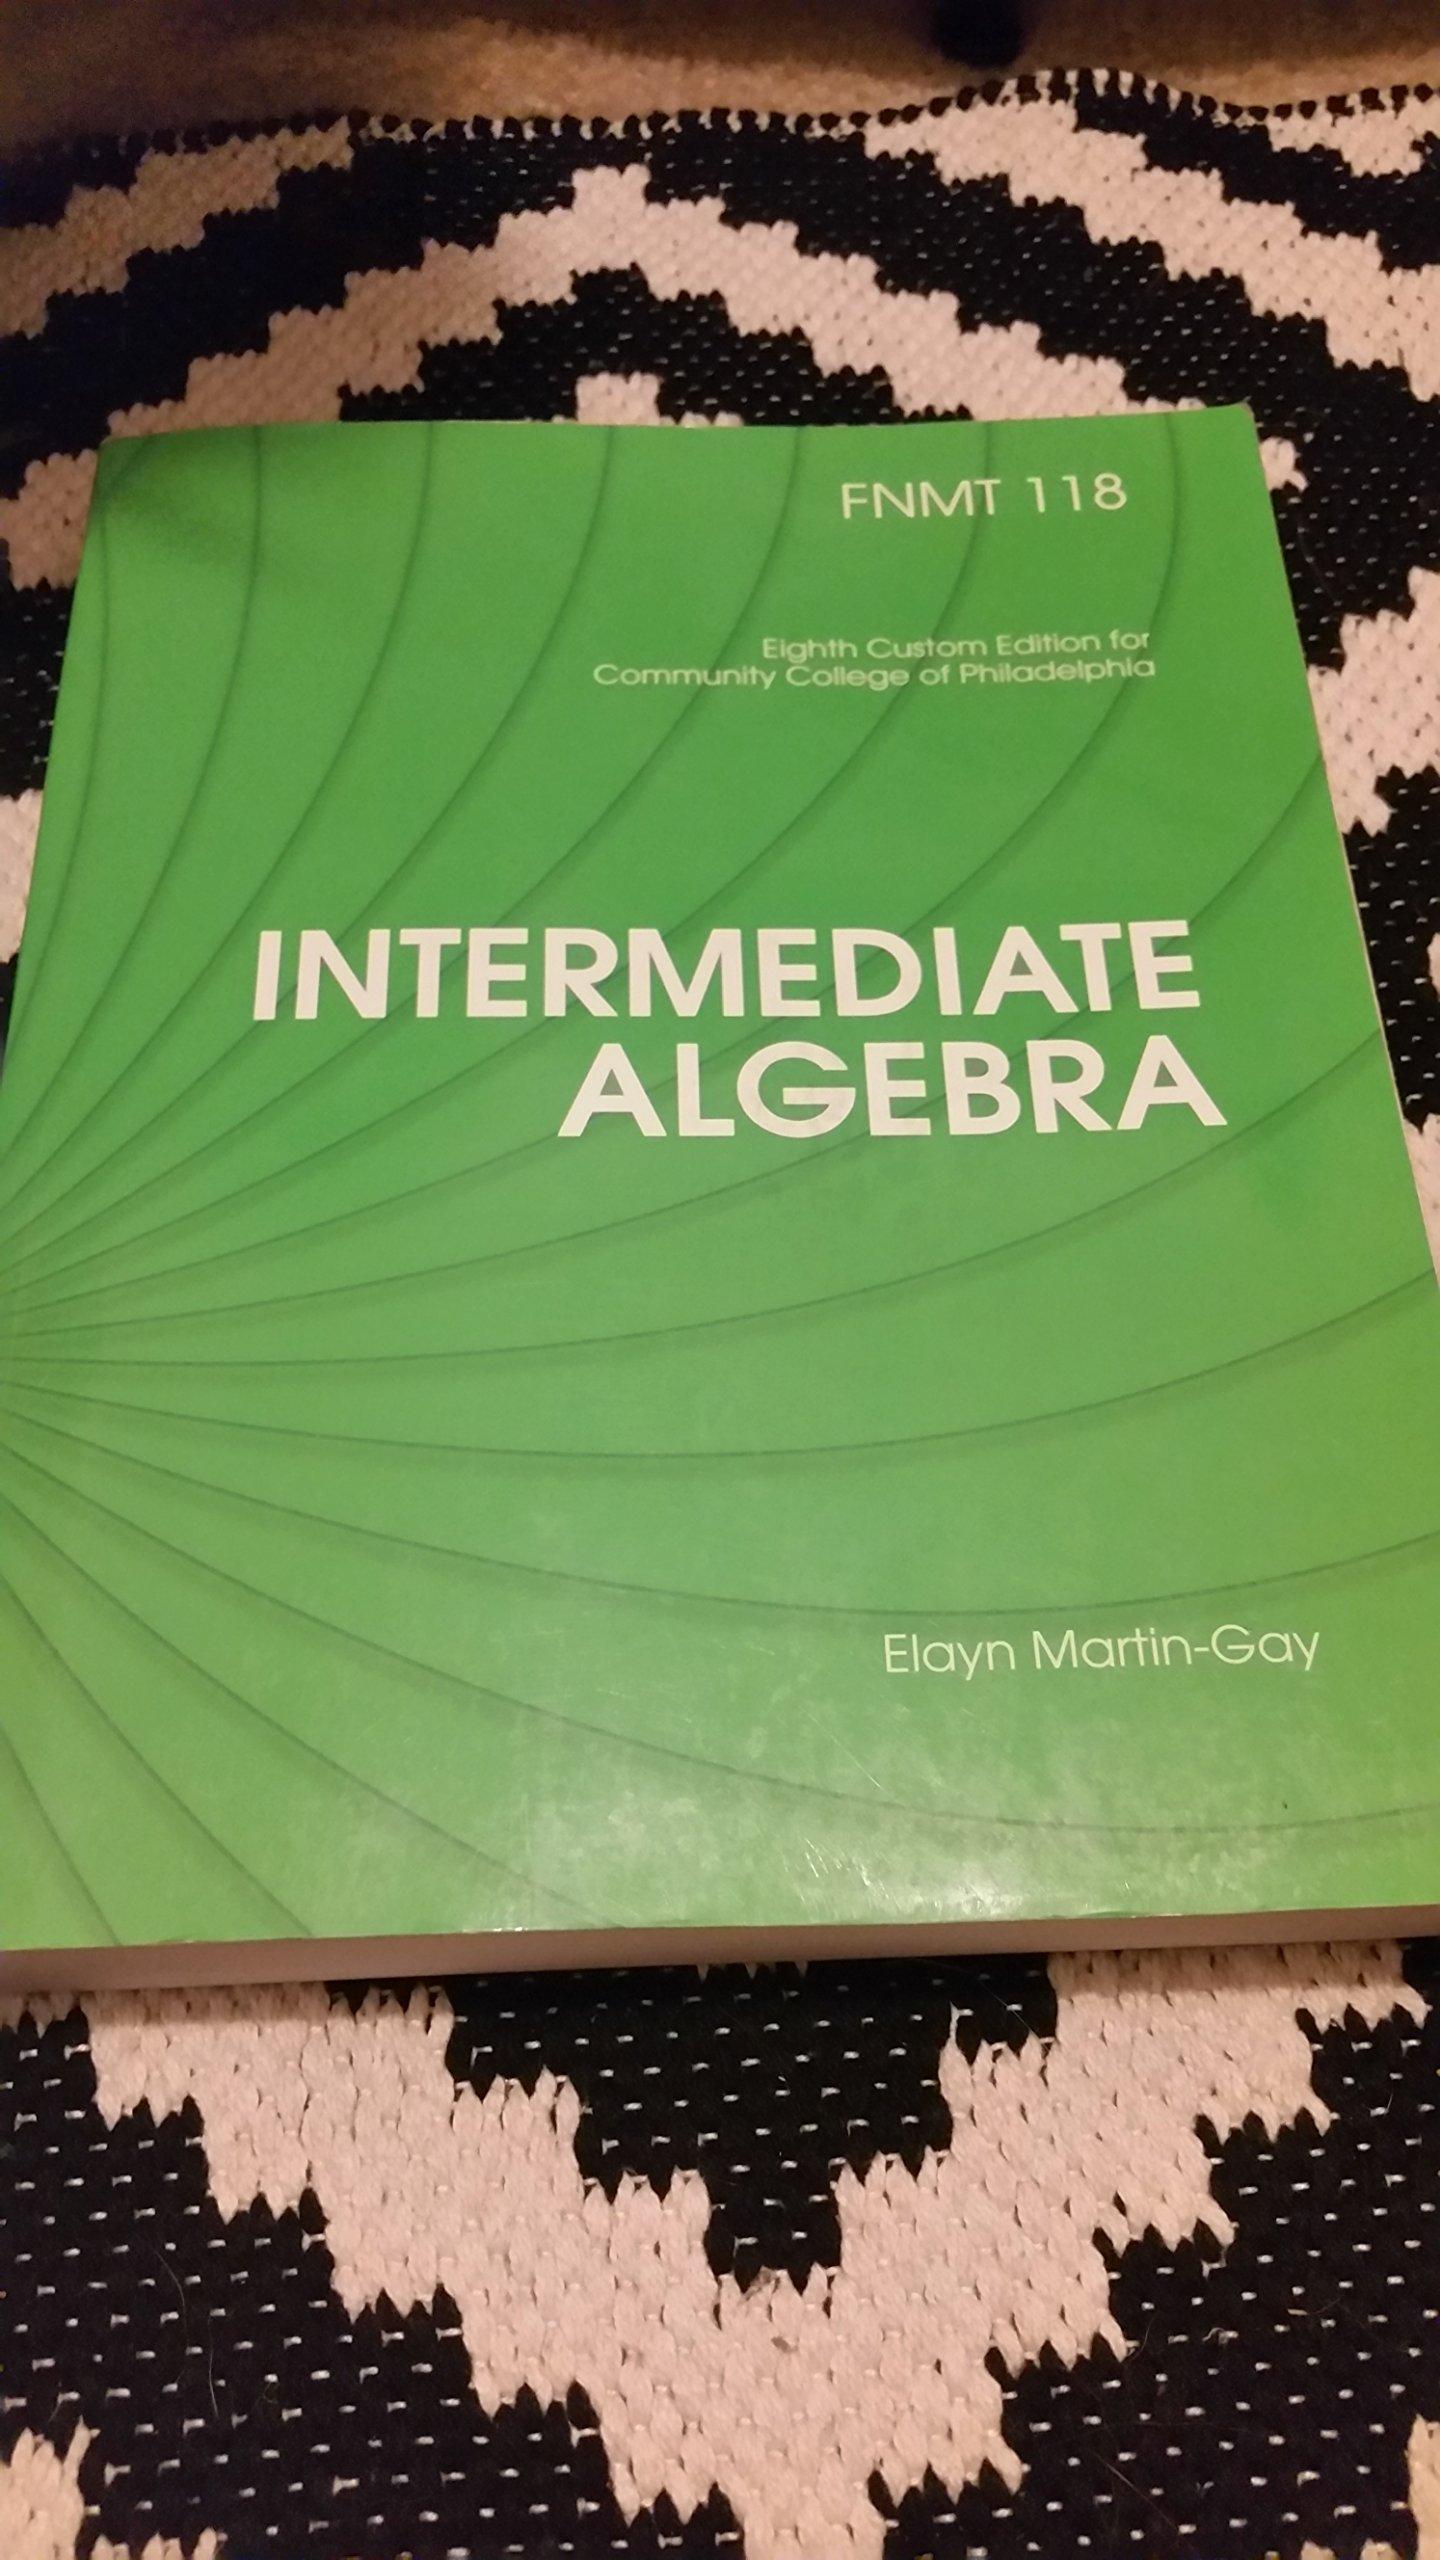 Intermediate Algebra FNMT 118 (Eighth Custom Edition for Community College of Philadelphia) pdf epub